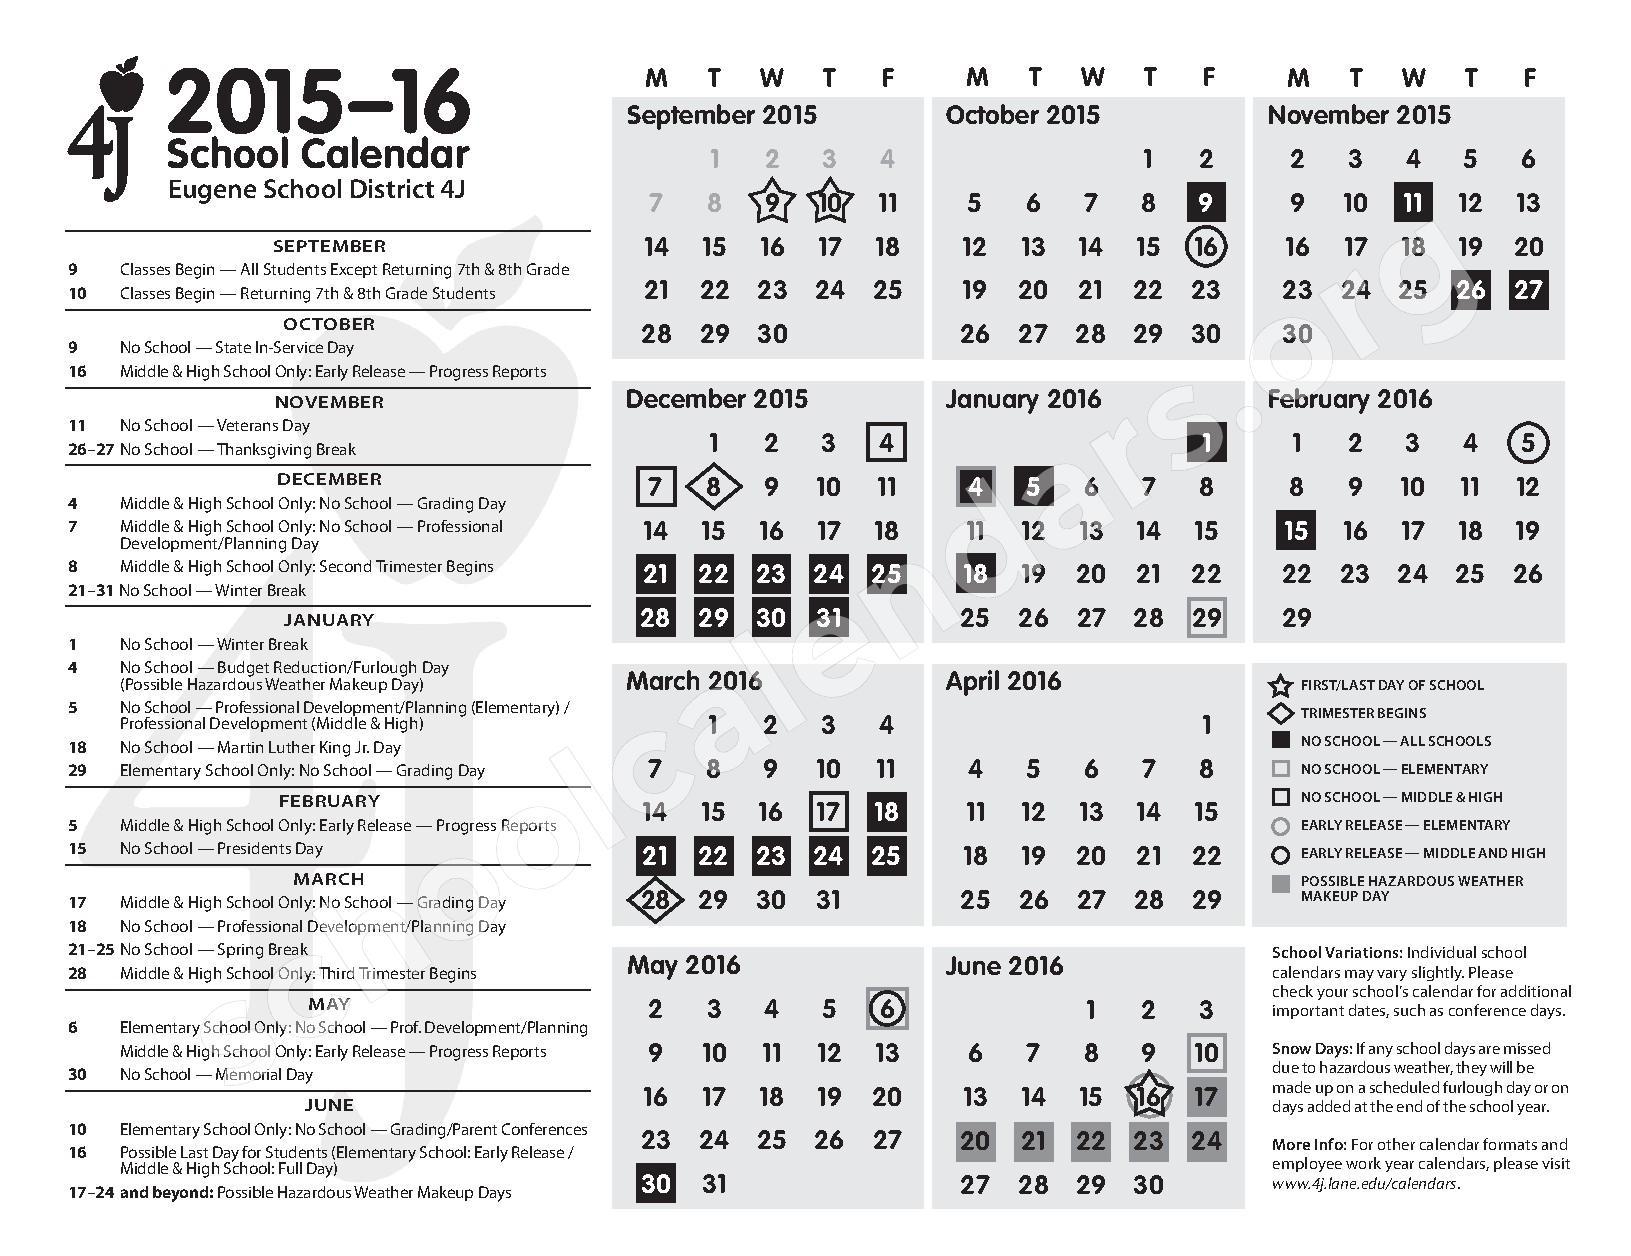 2015 - 2016 School Calendar – Eugene School District – page 1